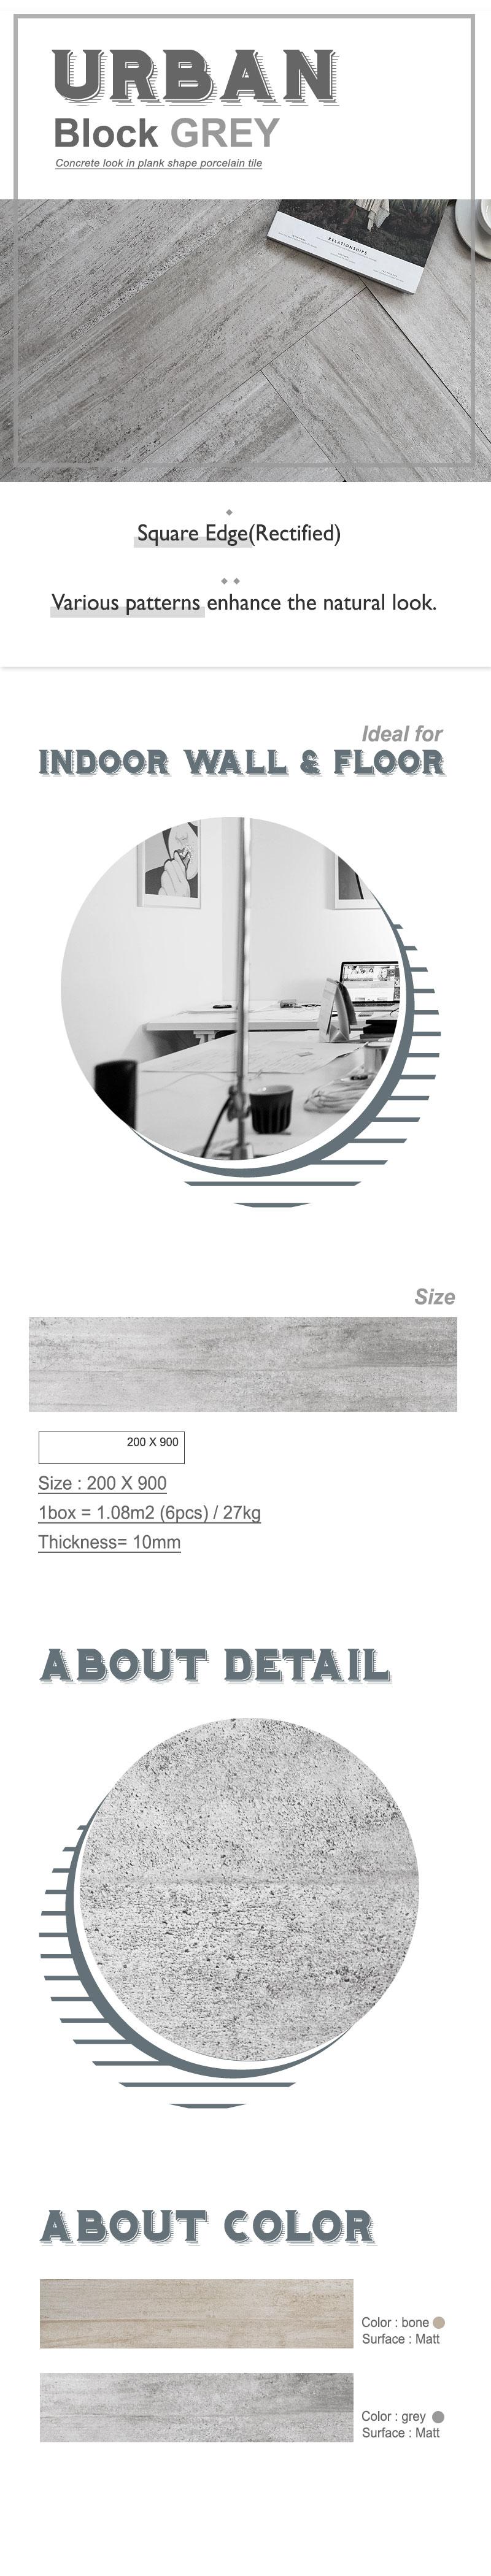 Urban-block-grey-200x900-_-page-design